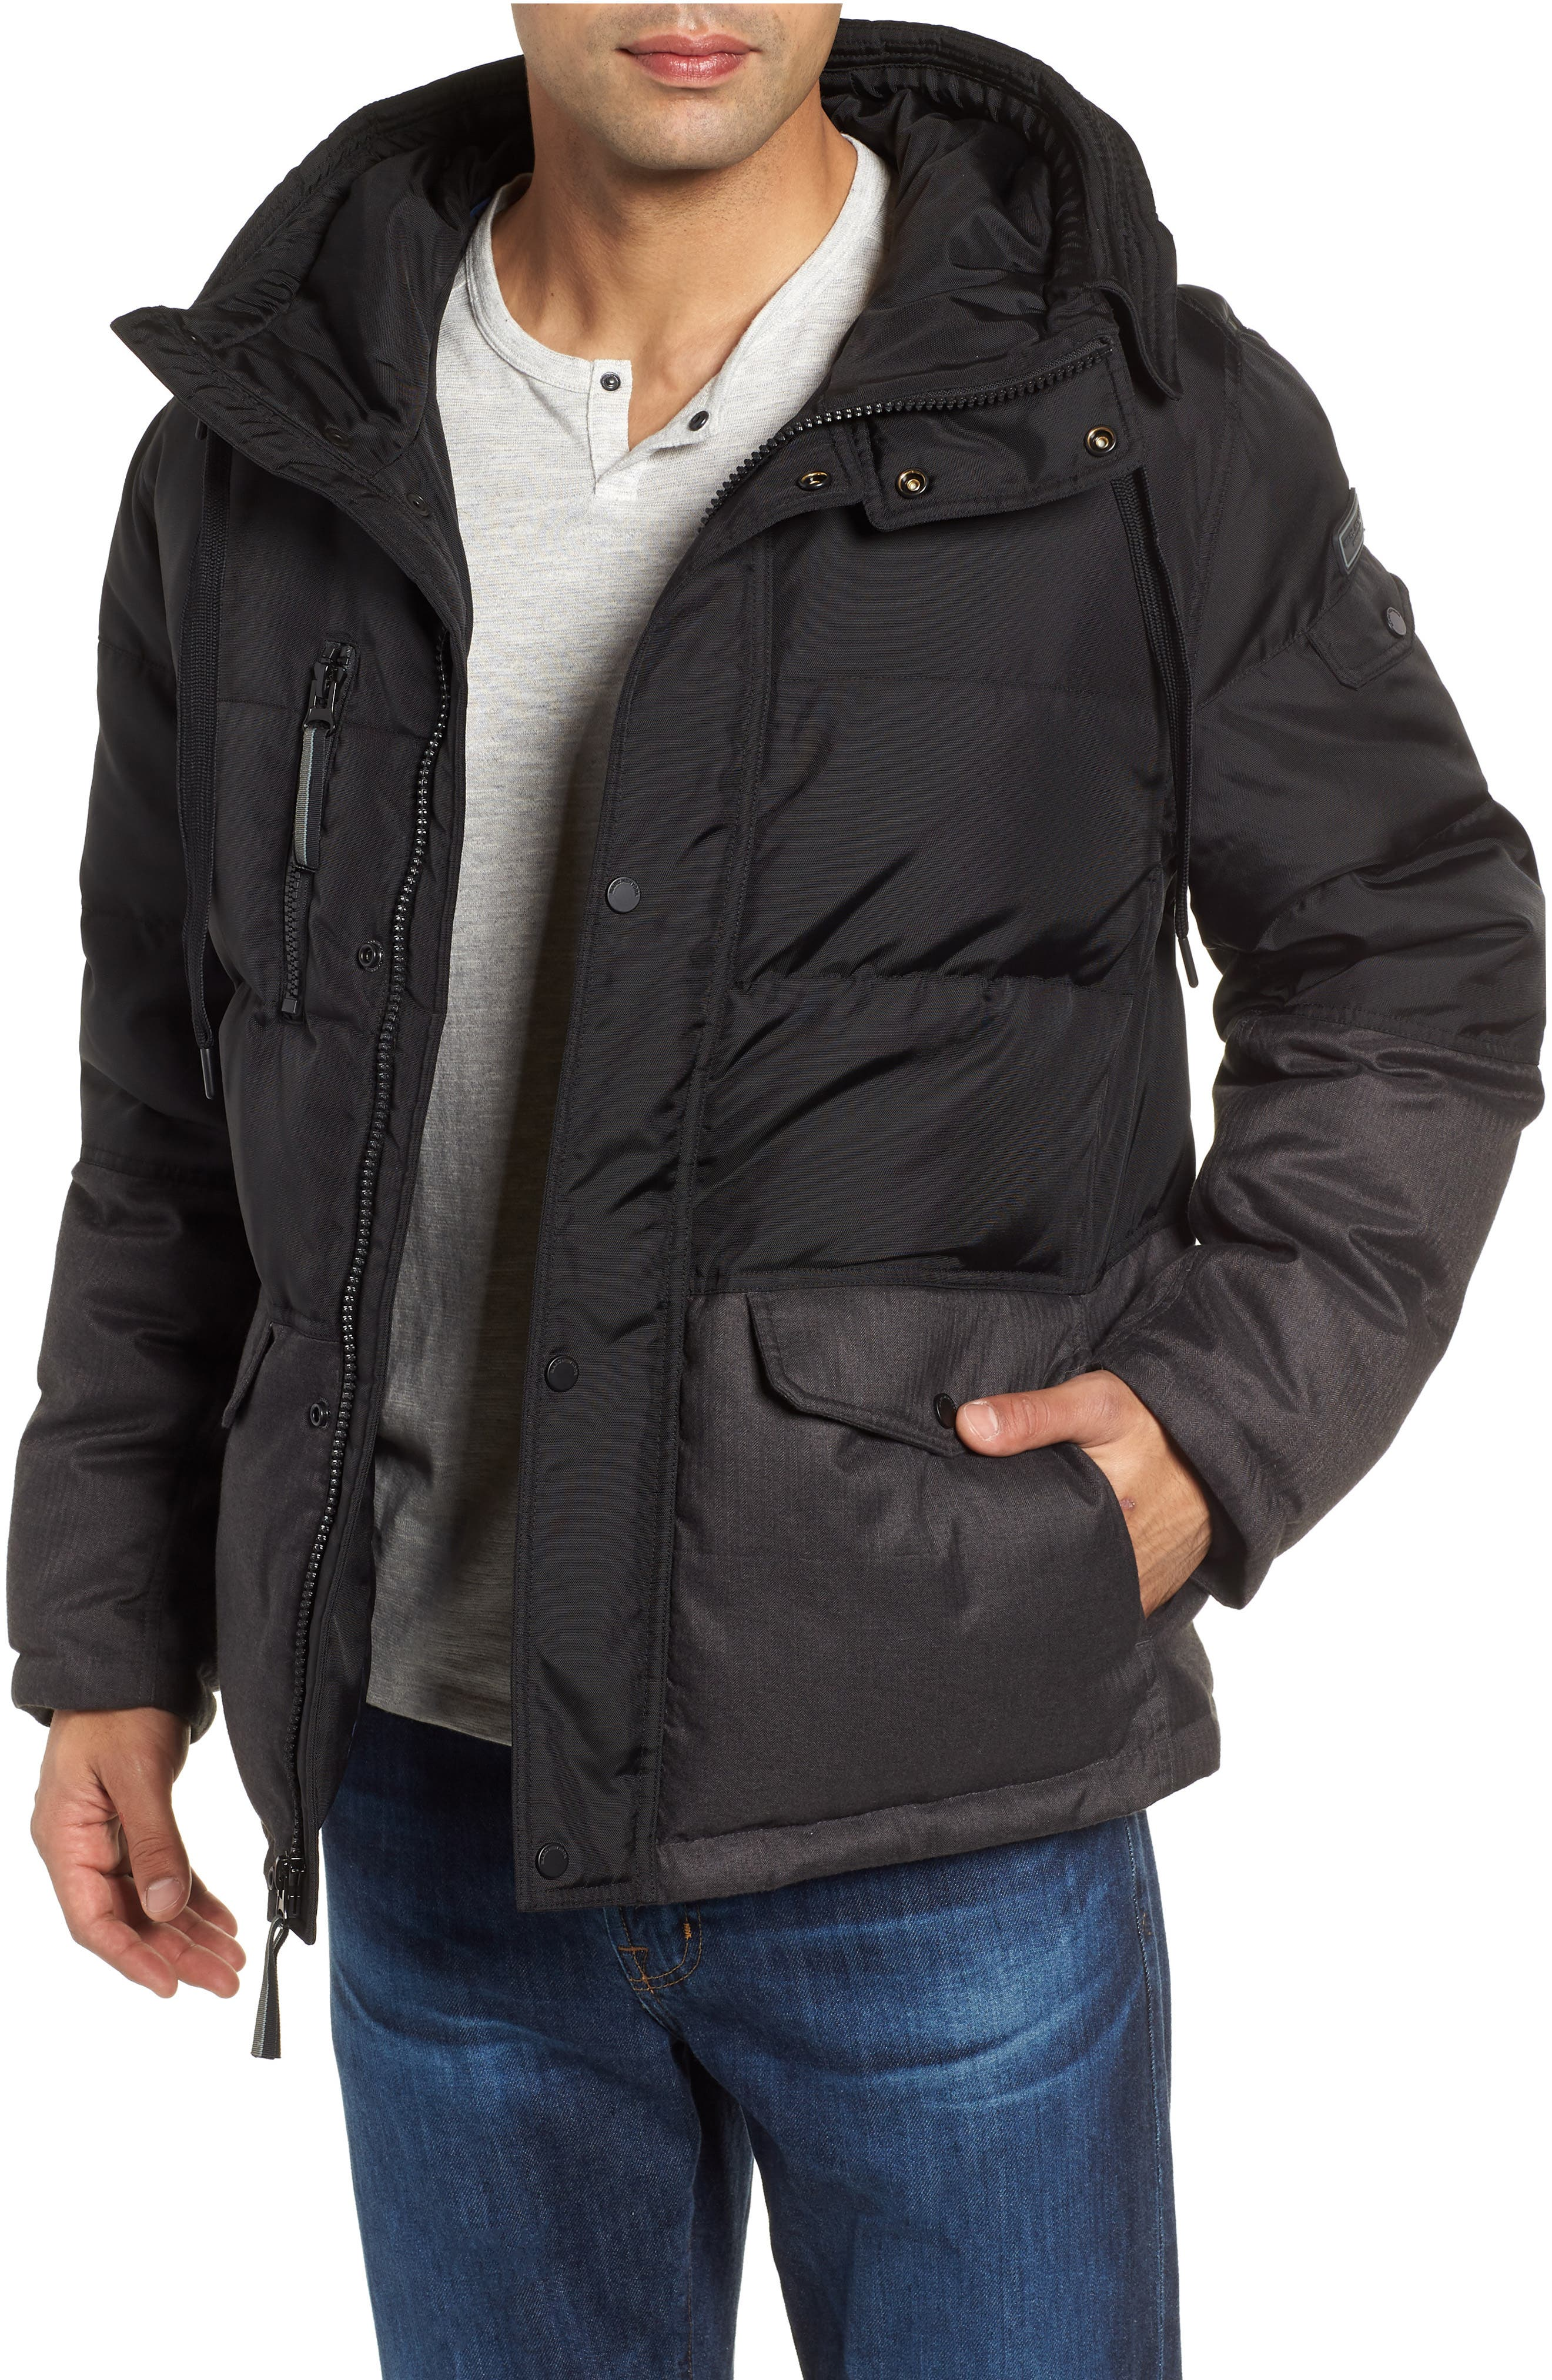 MARC NEW YORK,                             Stanton Oxford Puffer Jacket,                             Main thumbnail 1, color,                             BLACK